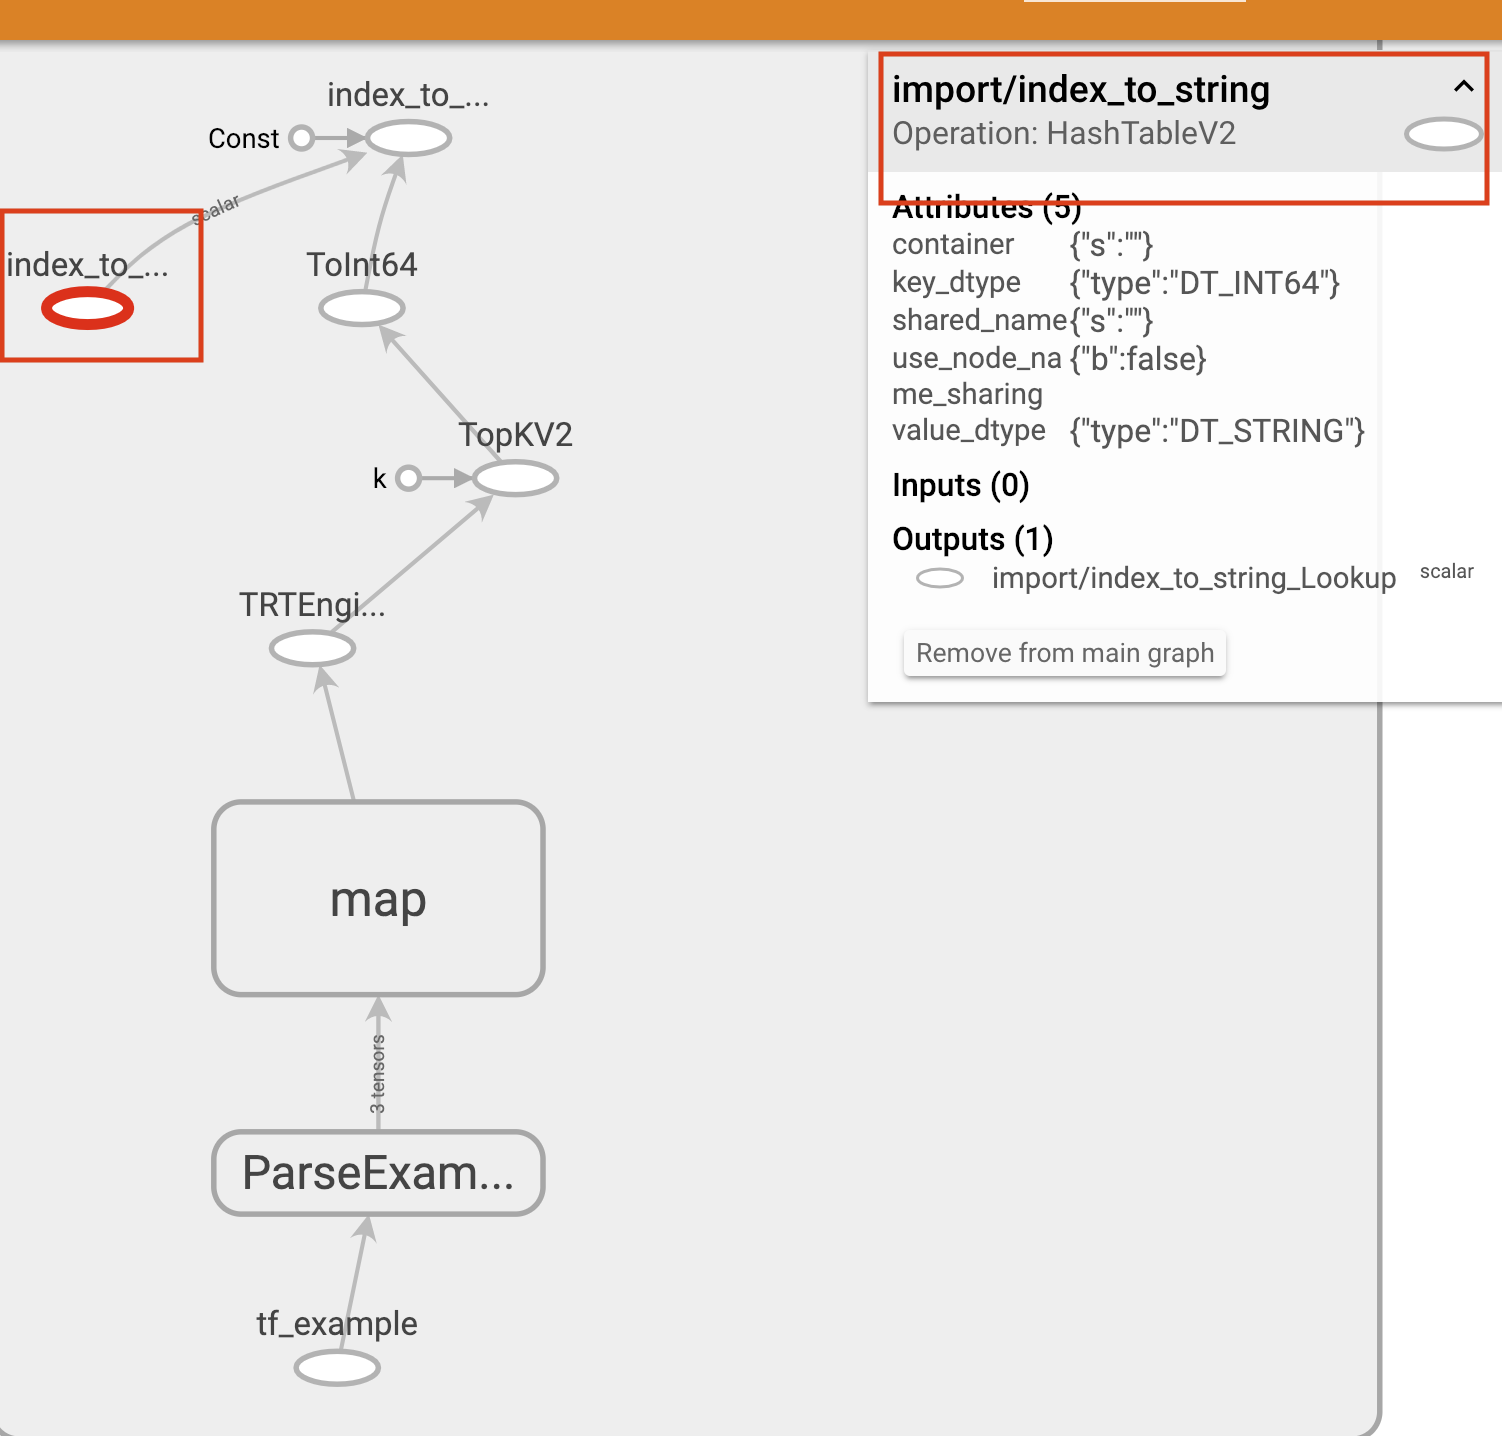 saved_model_cli tensorrt convert bug: saved_model_main_op collection